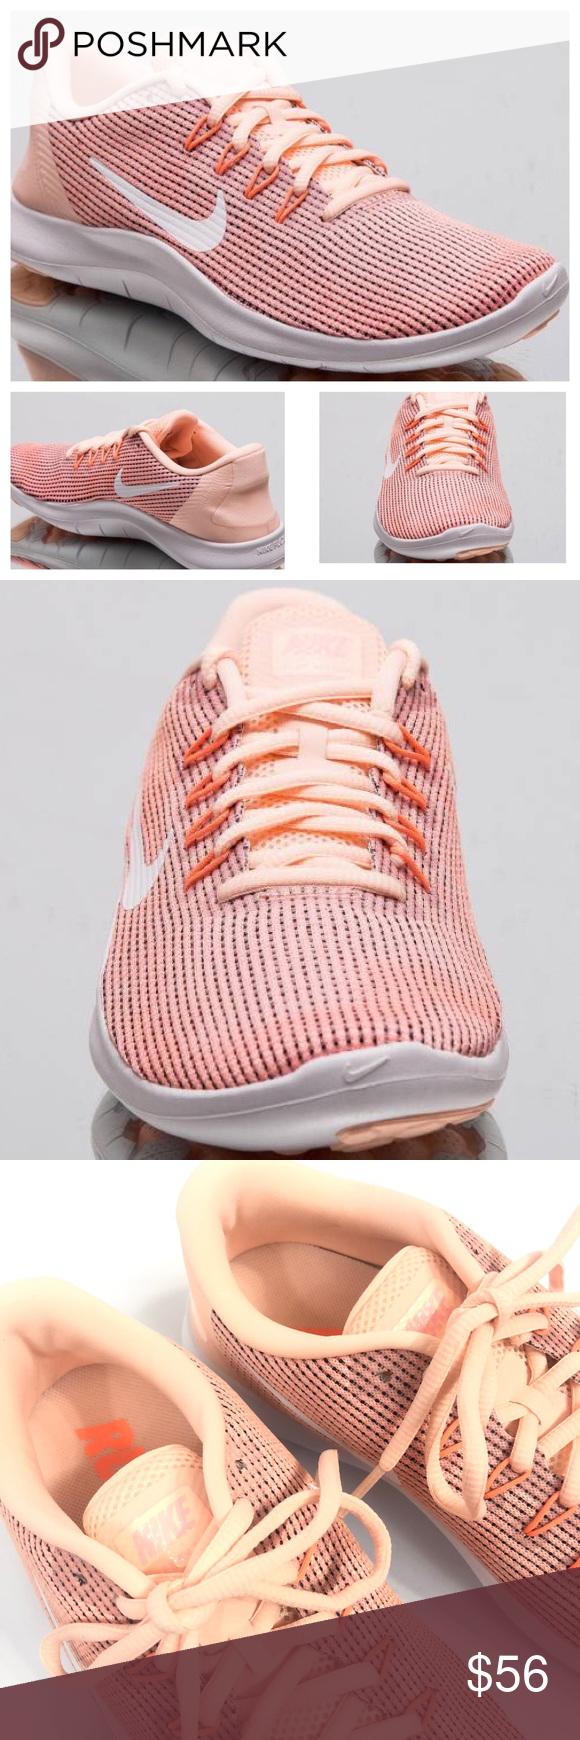 Nike flex 2018 rn Running Shoes AA7408